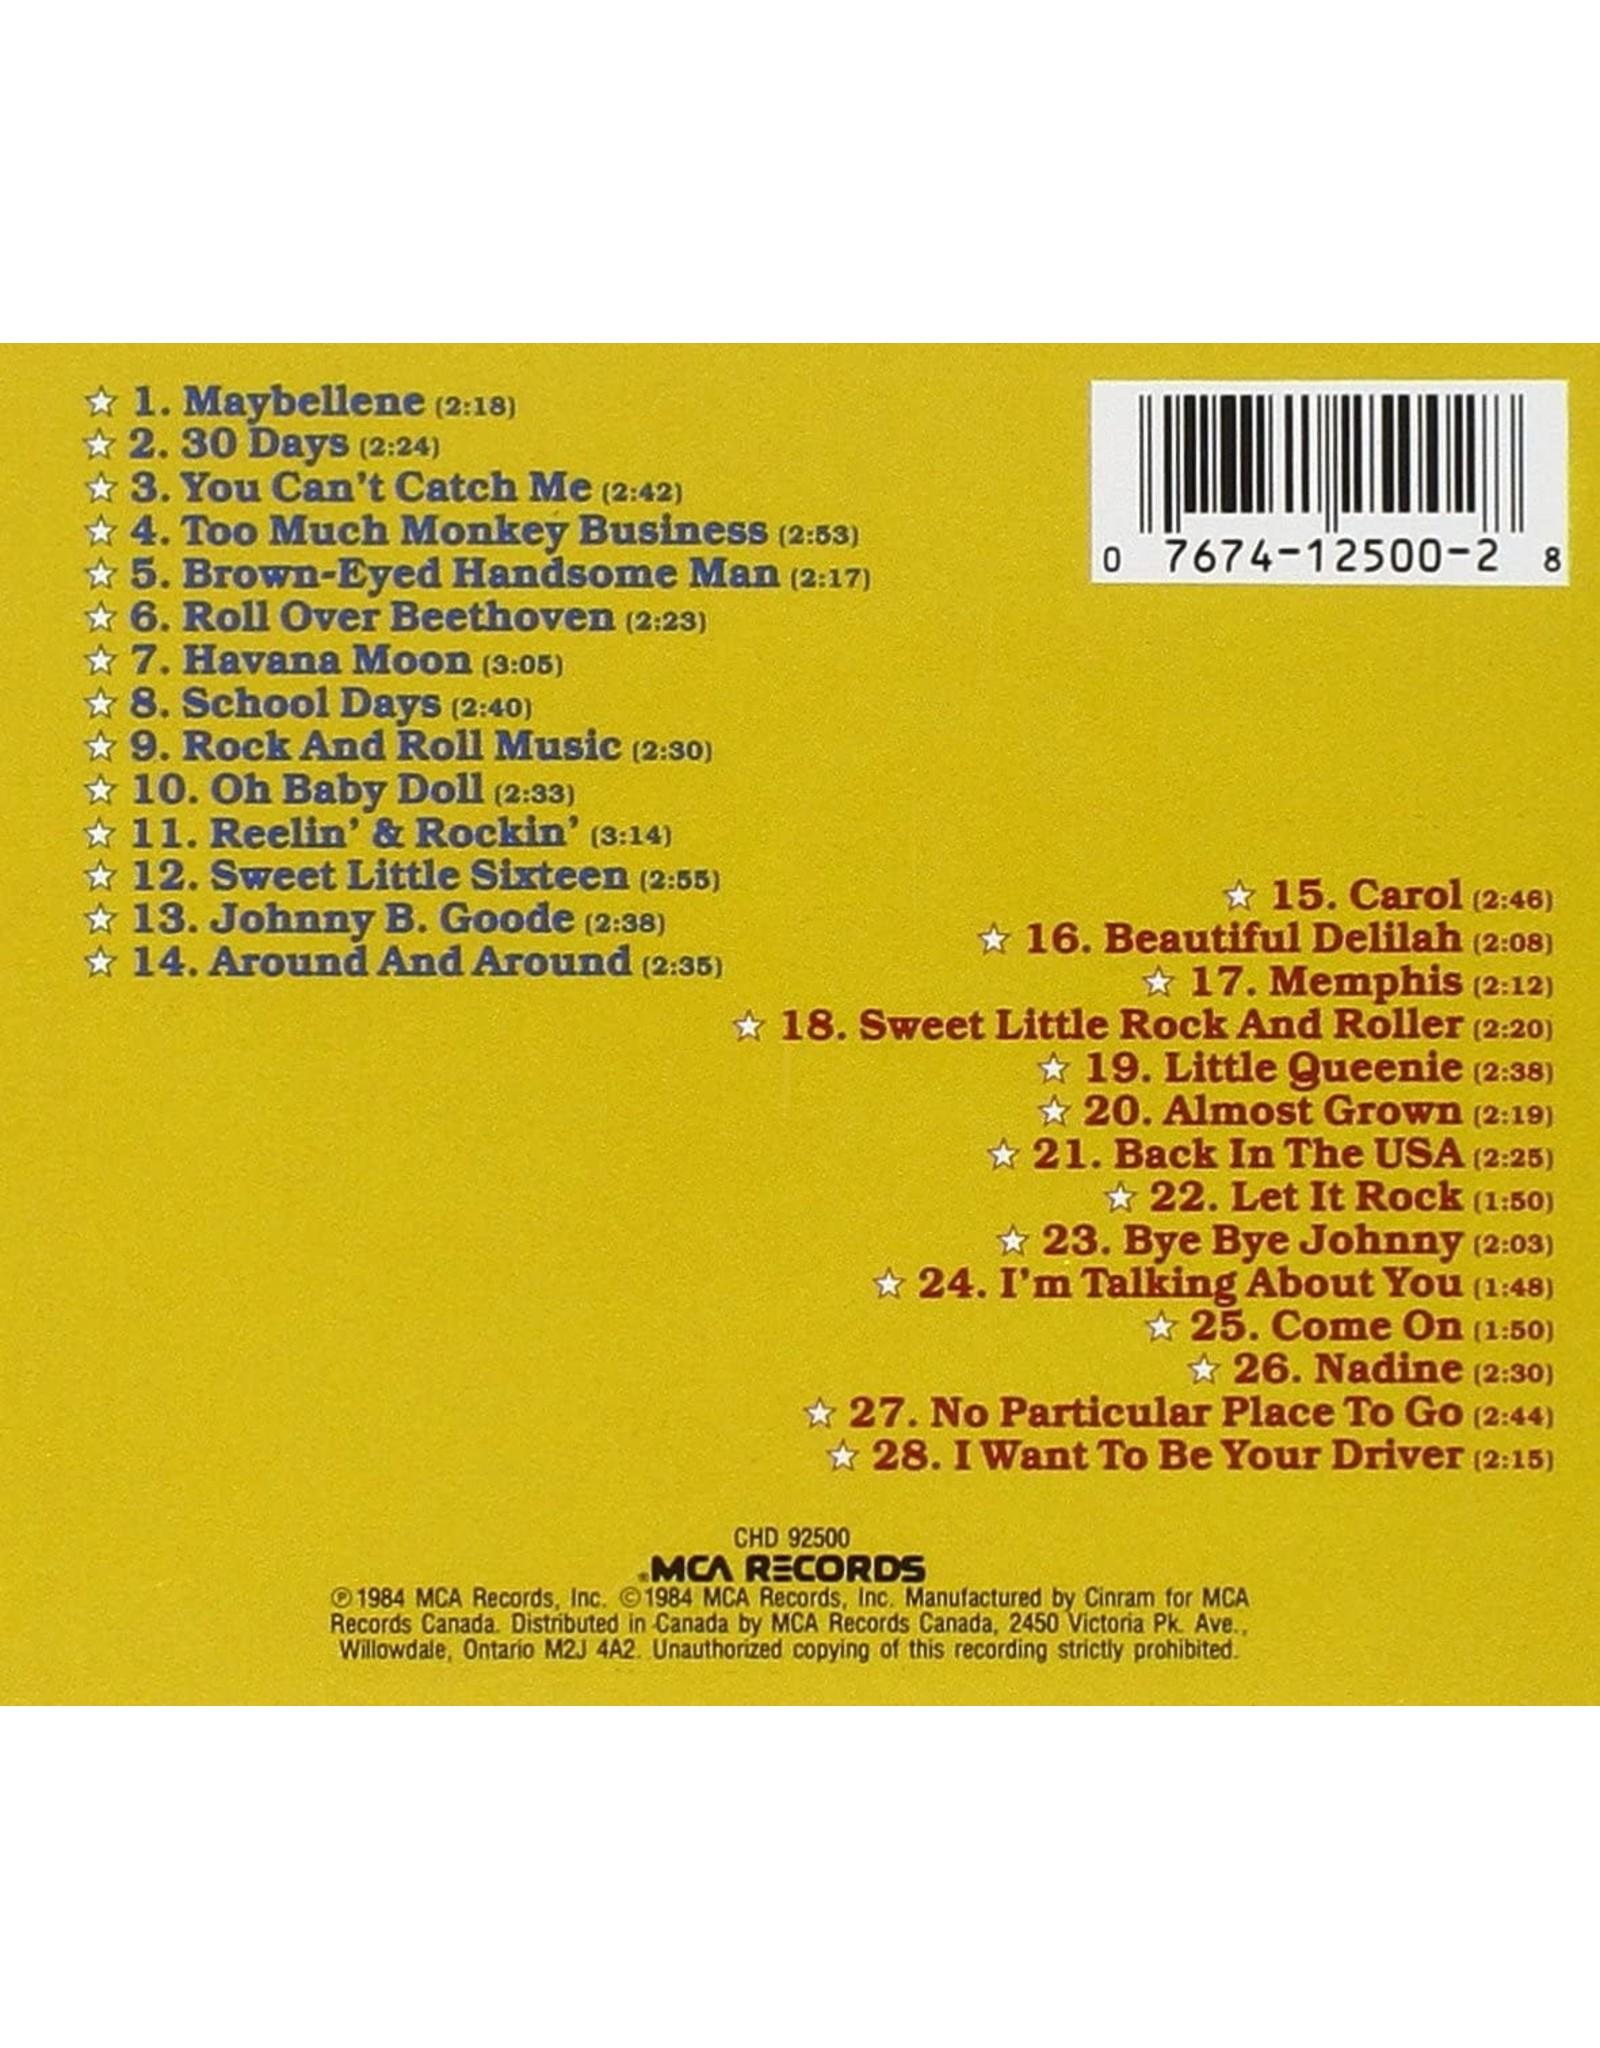 Chuck Berry - The Great Twenty-Eight